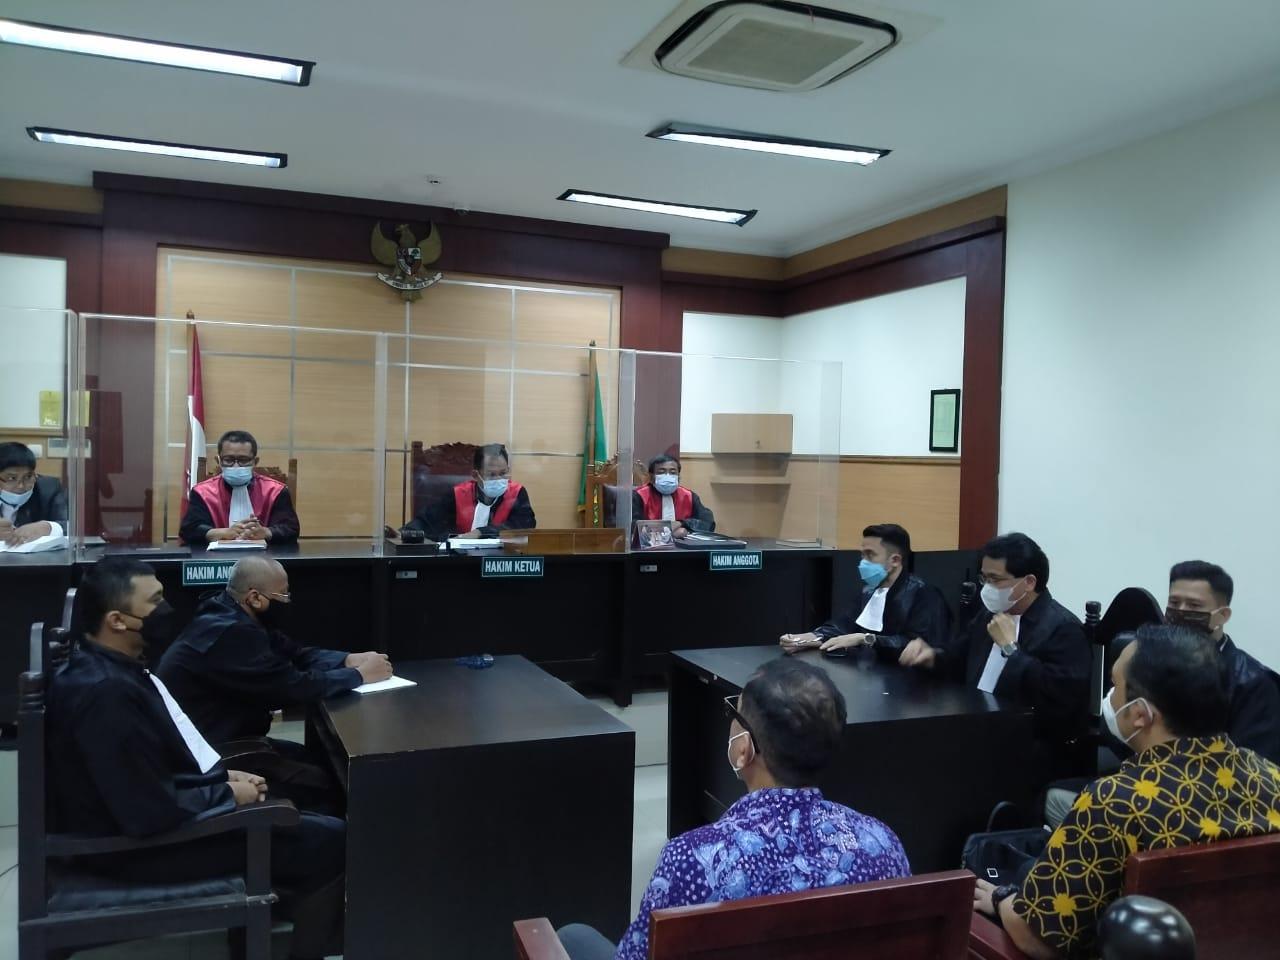 https: img.okezone.com content 2021 06 14 338 2425078 eks-dirut-garuda-indonesia-divonis-1-tahun-penjara-terkait-kasus-harley-davidson-078MEjjFev.jpg